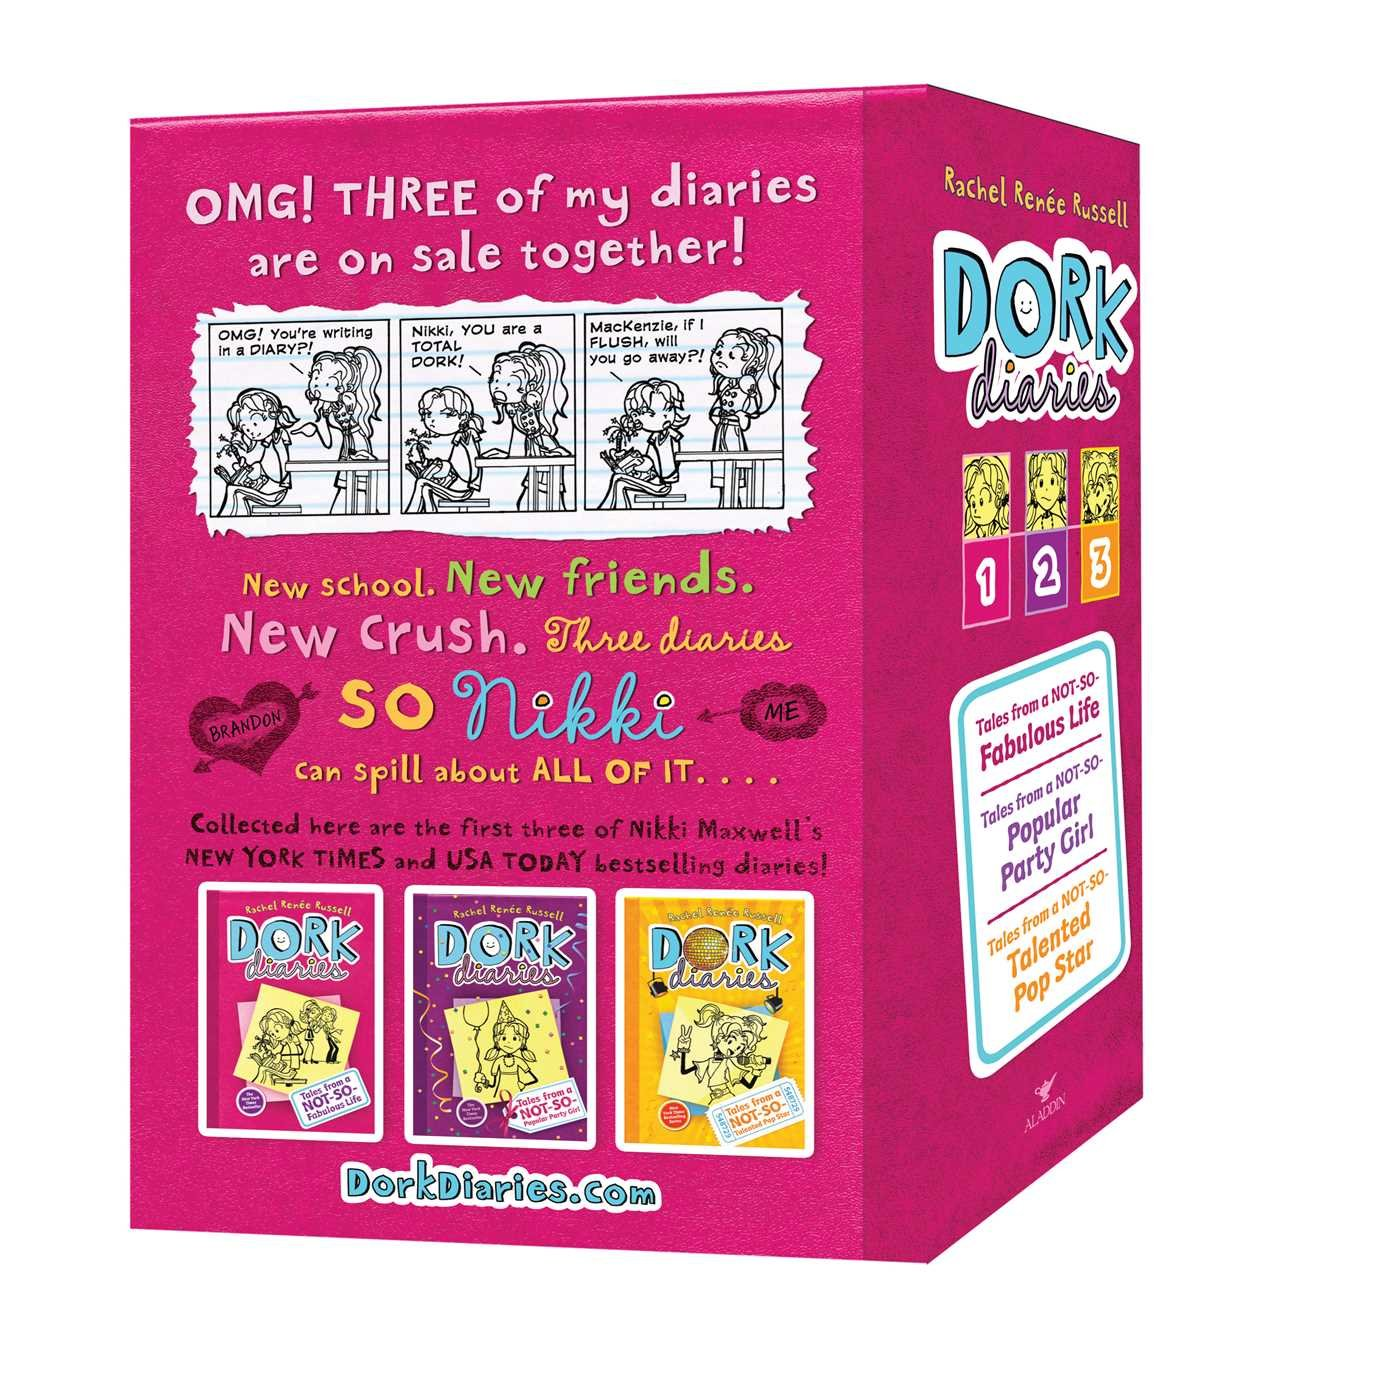 Dork Diaries Box Set (Book 1-3): Dork Diaries; Dork Diaries 2; Dork Diaries 3 by Aladdin Paperbacks (Image #1)